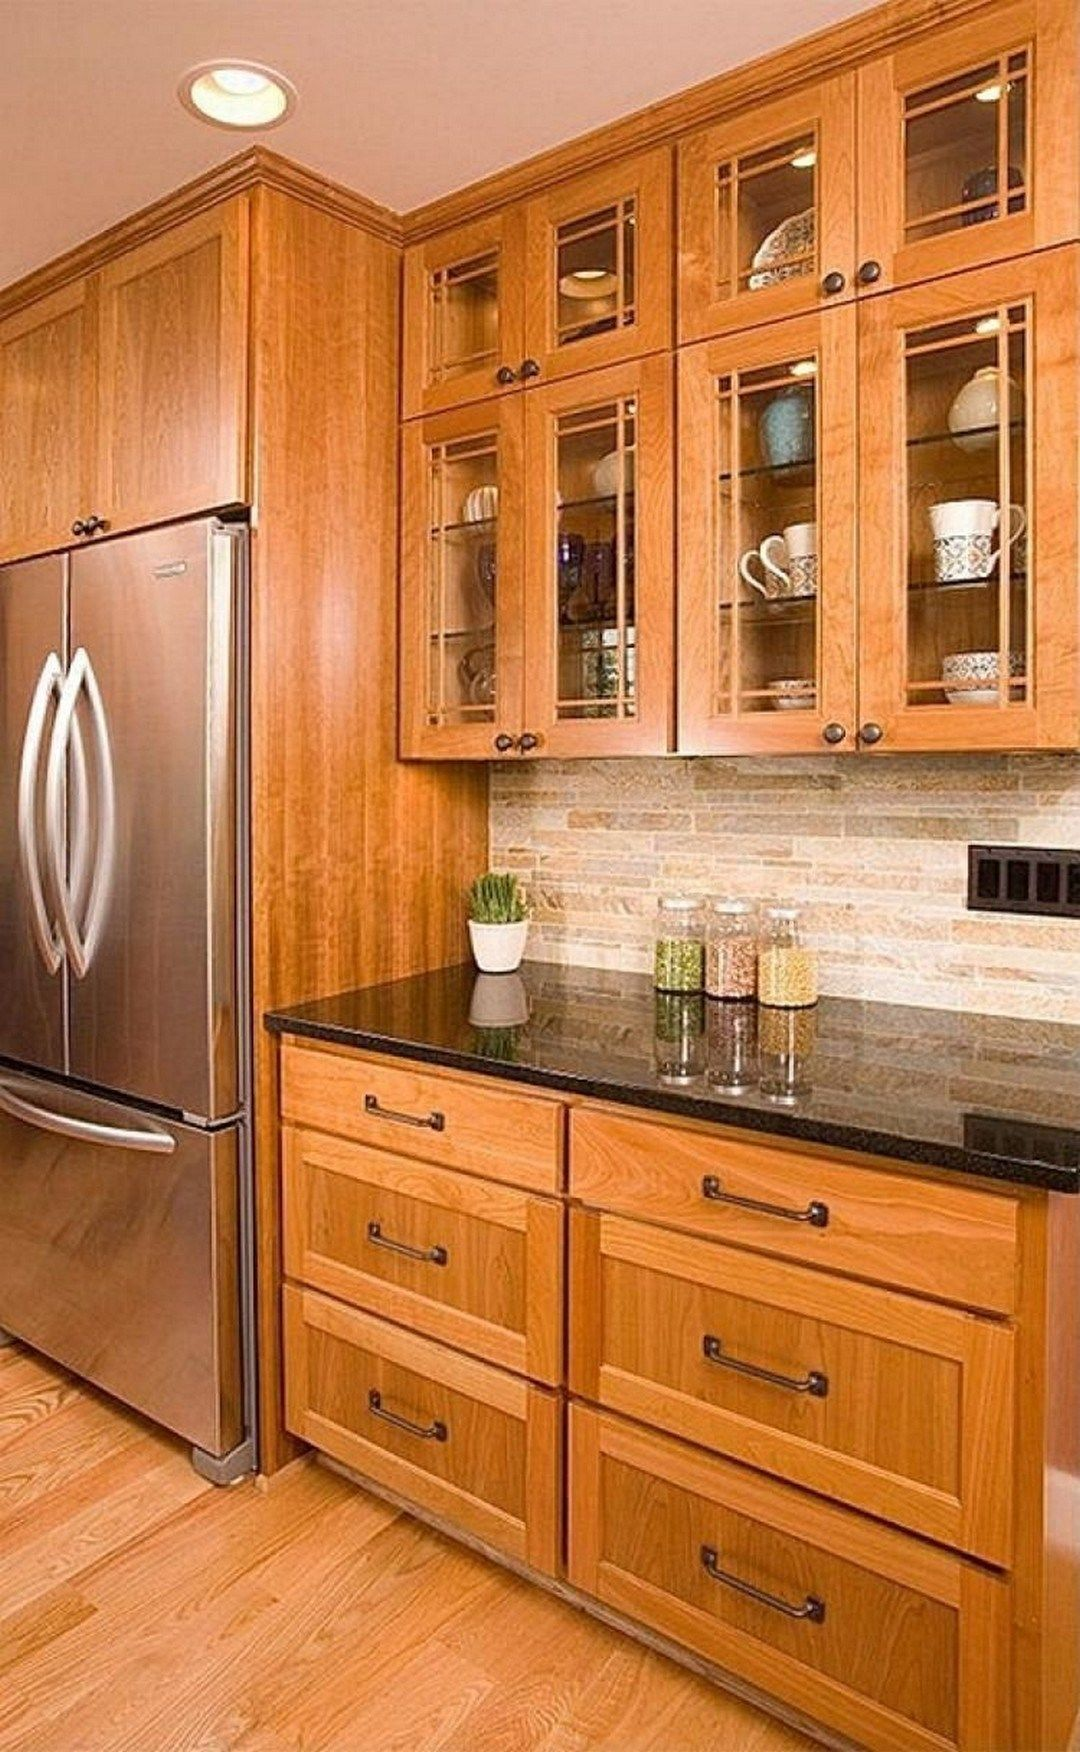 29 Fantastic Kitchen Backsplash Ideas With Oak (3